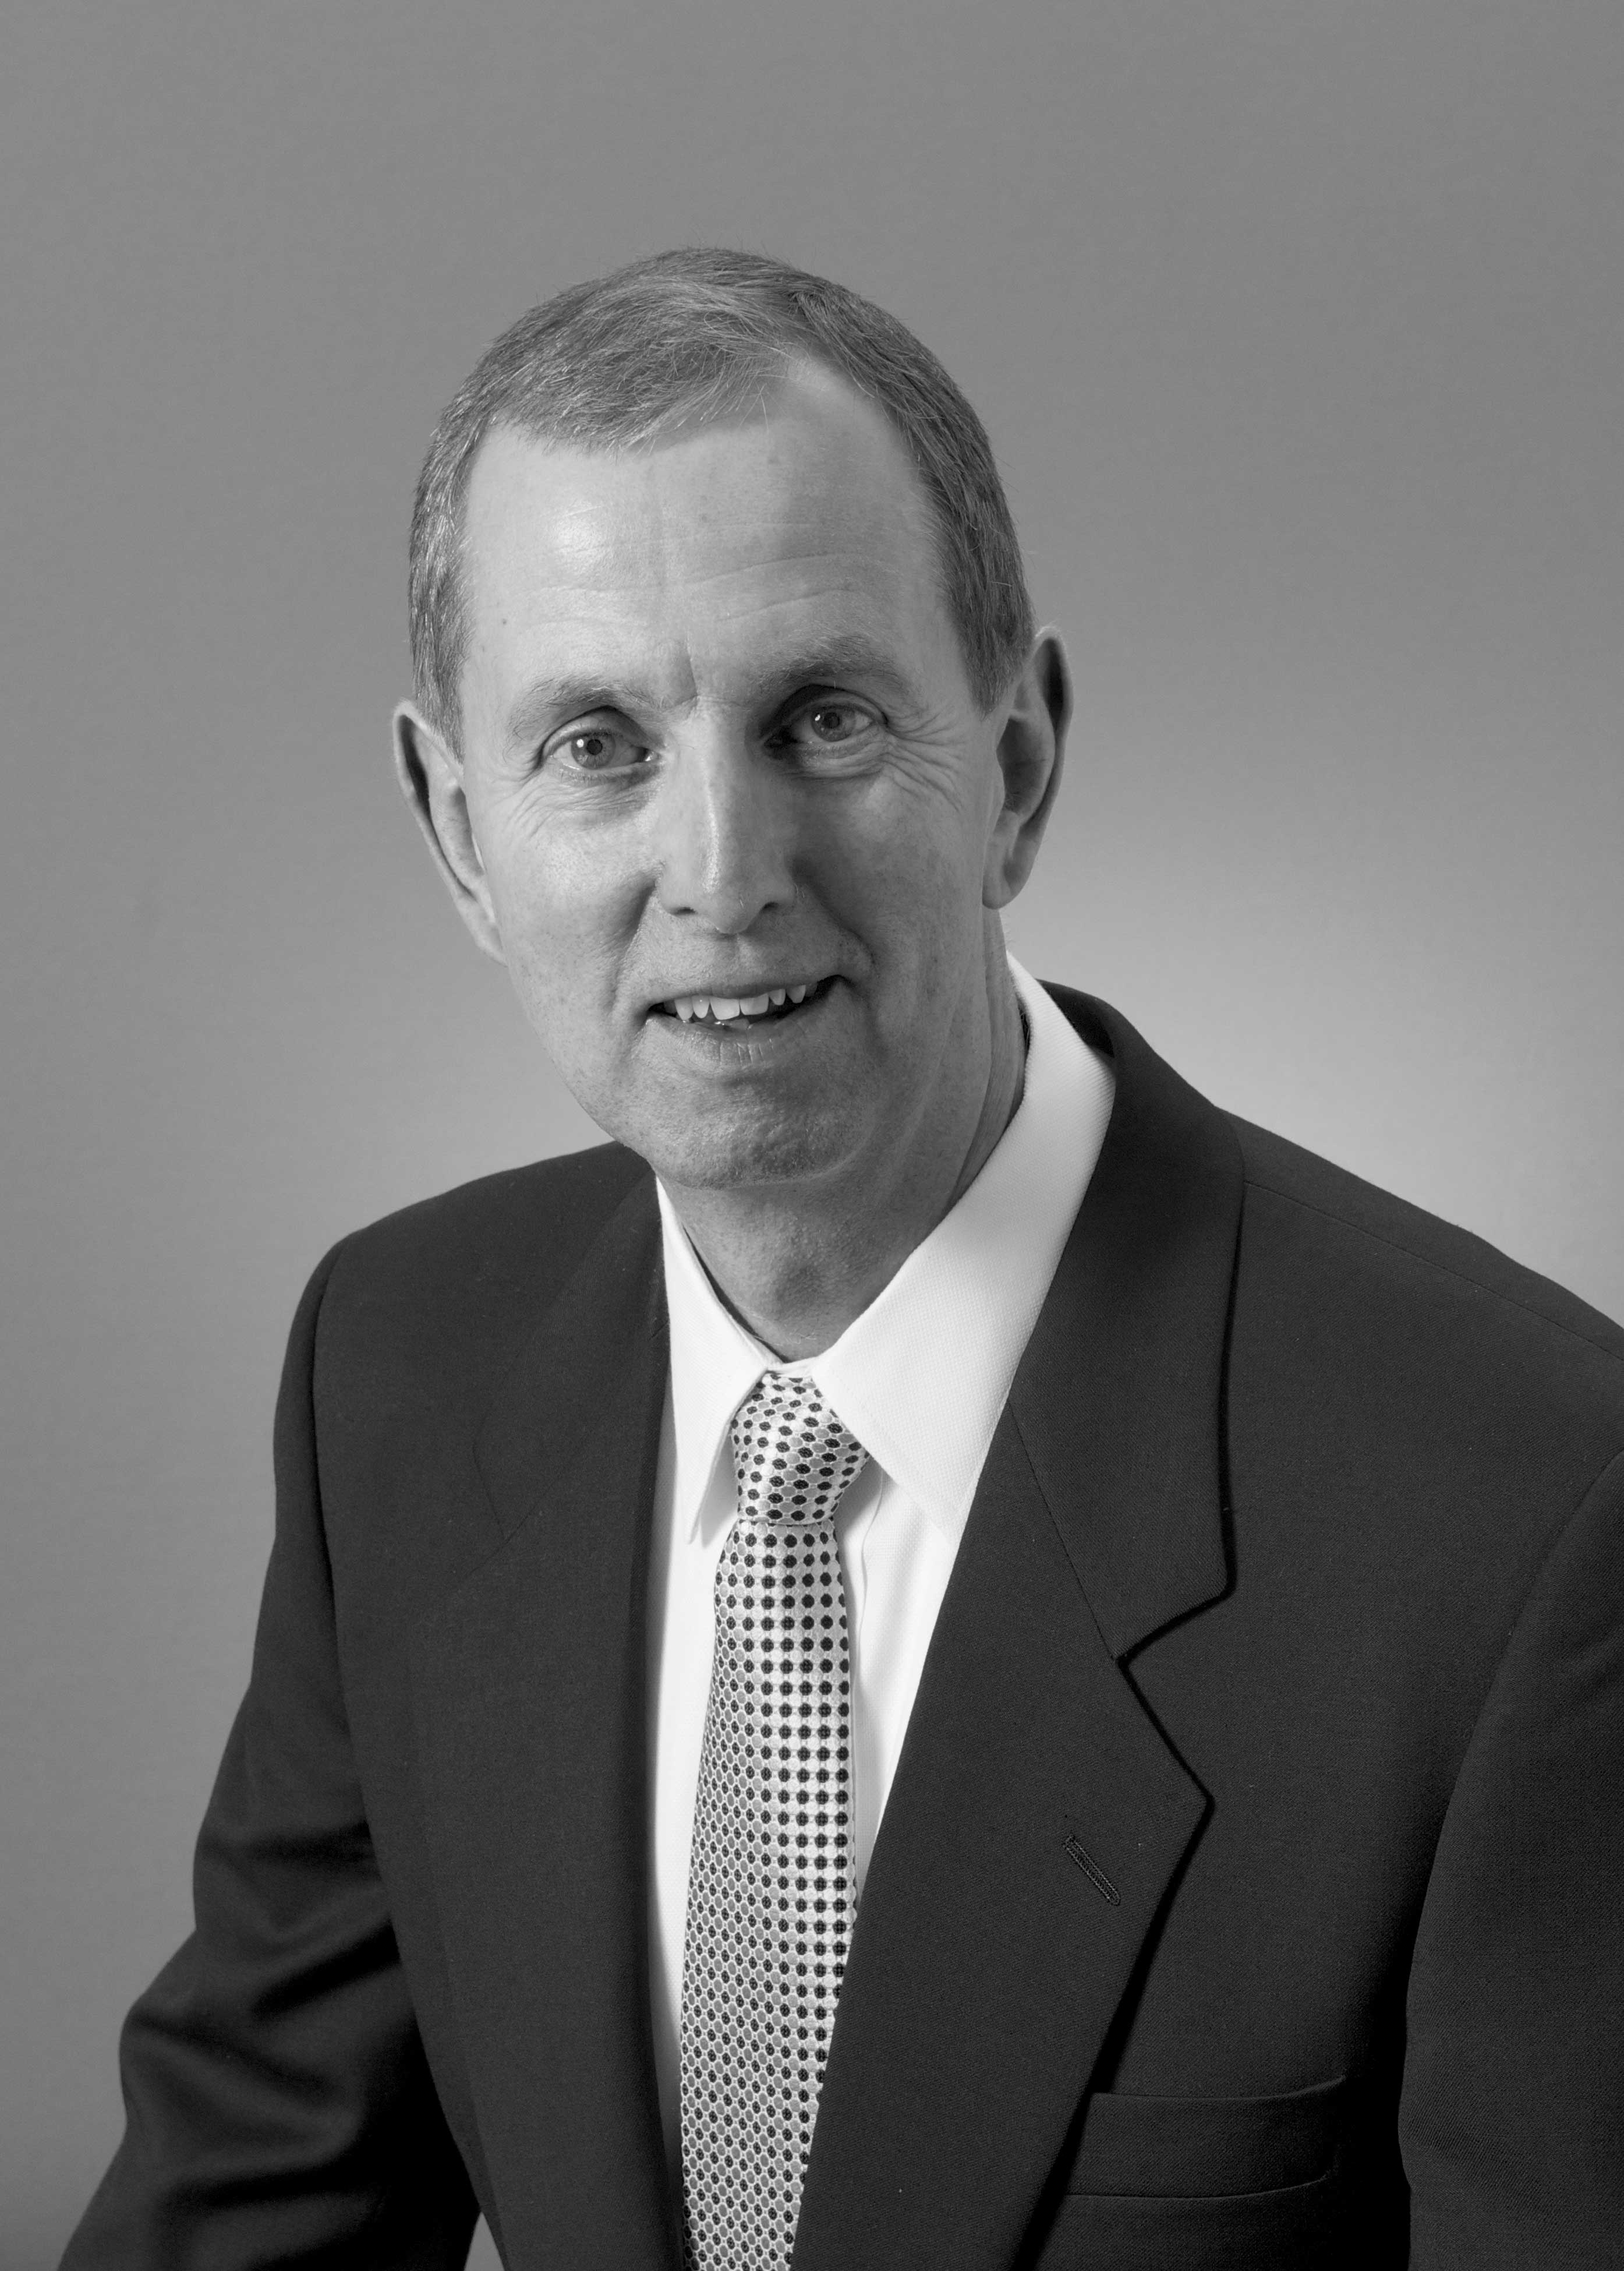 Robert Archambault